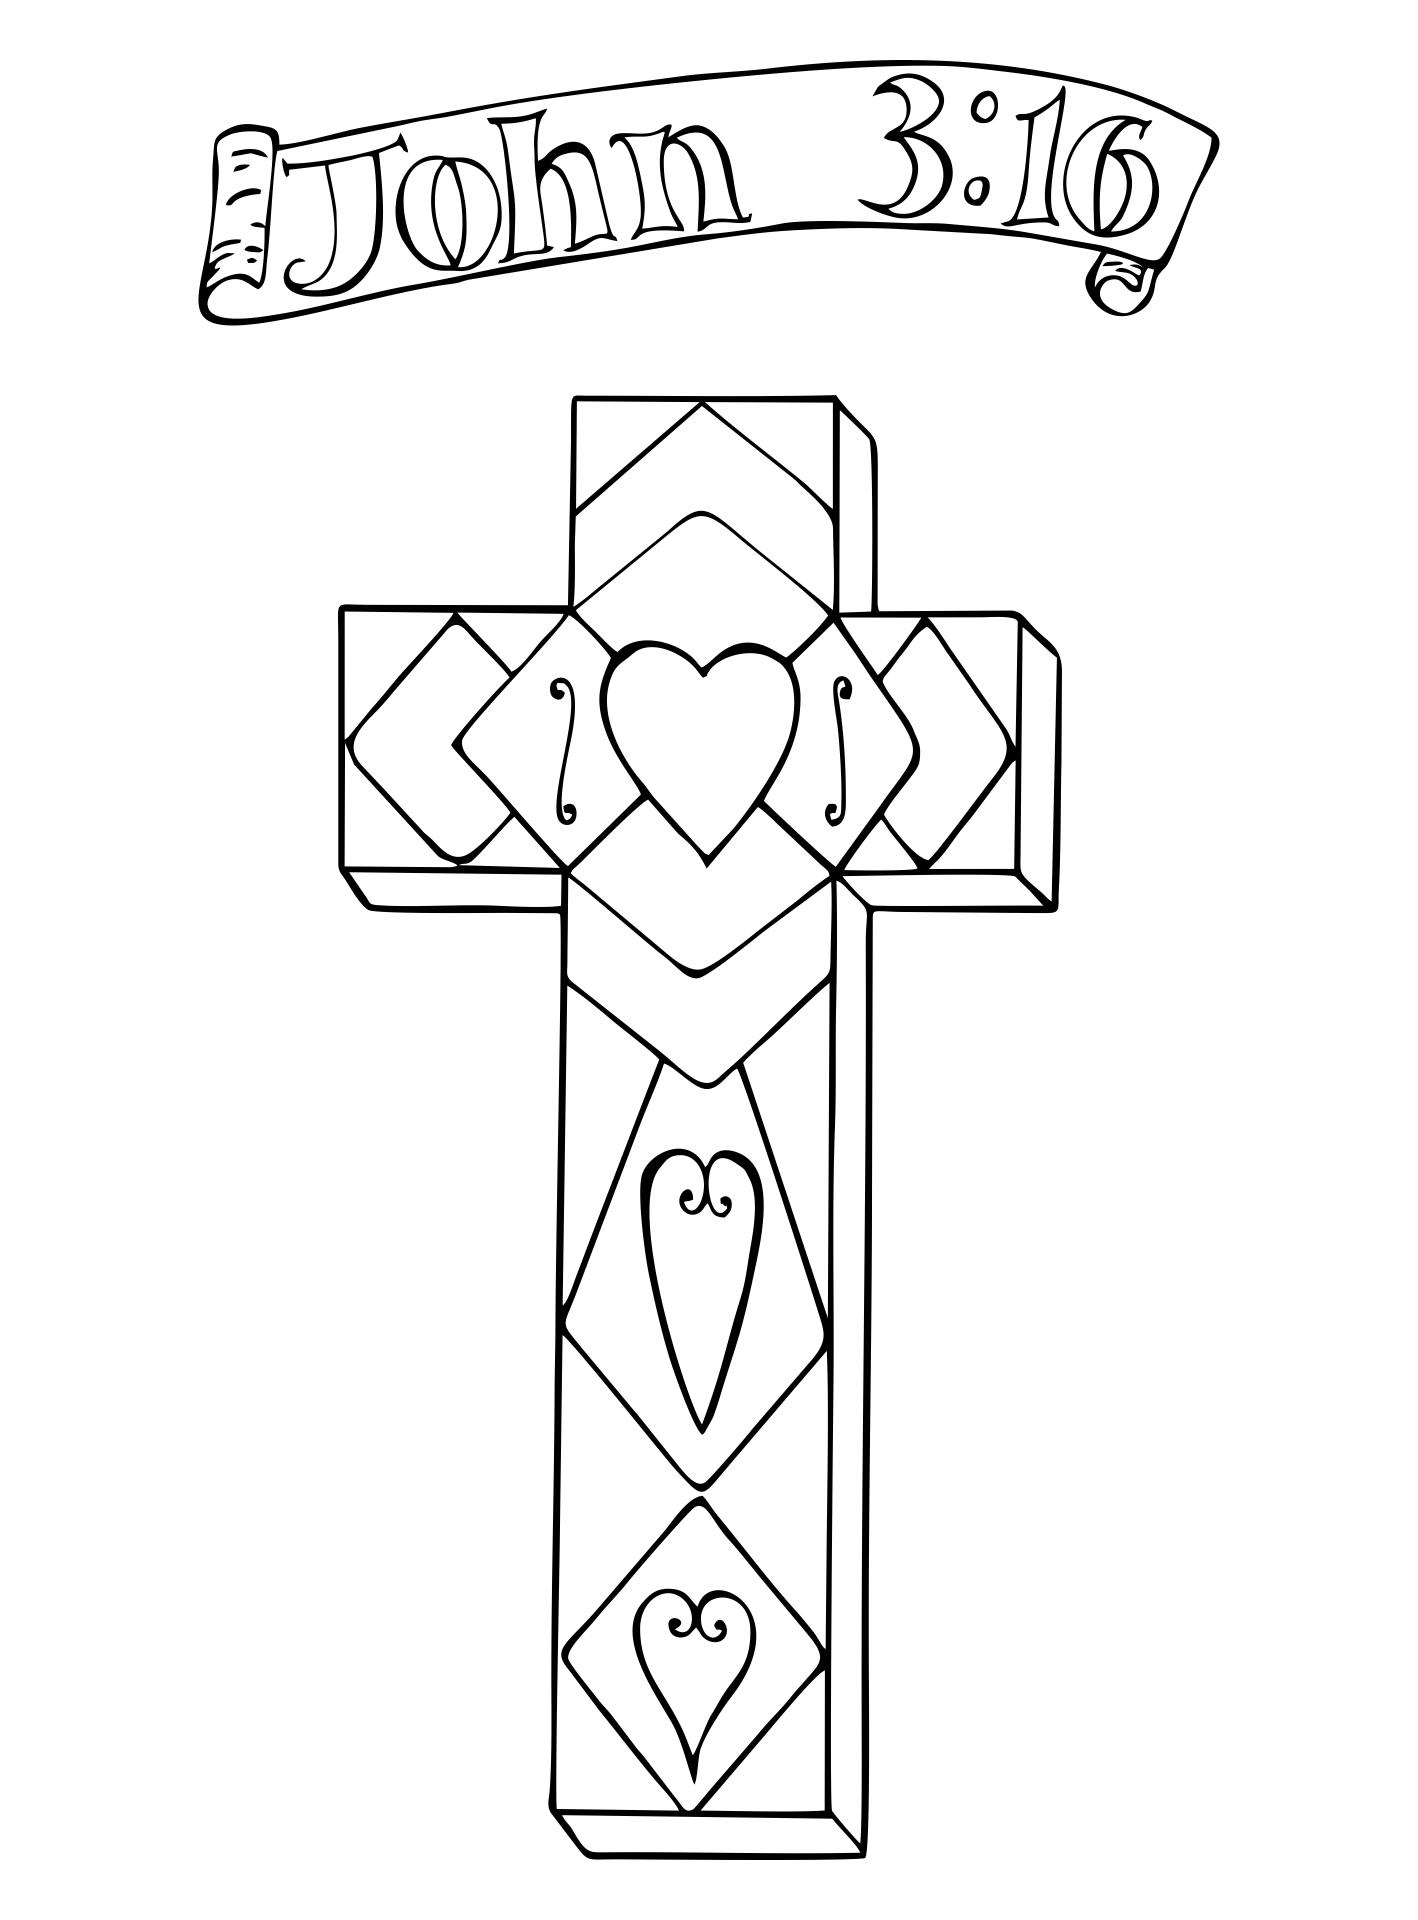 Printable Christian Christmas Coloring Pages for Kids